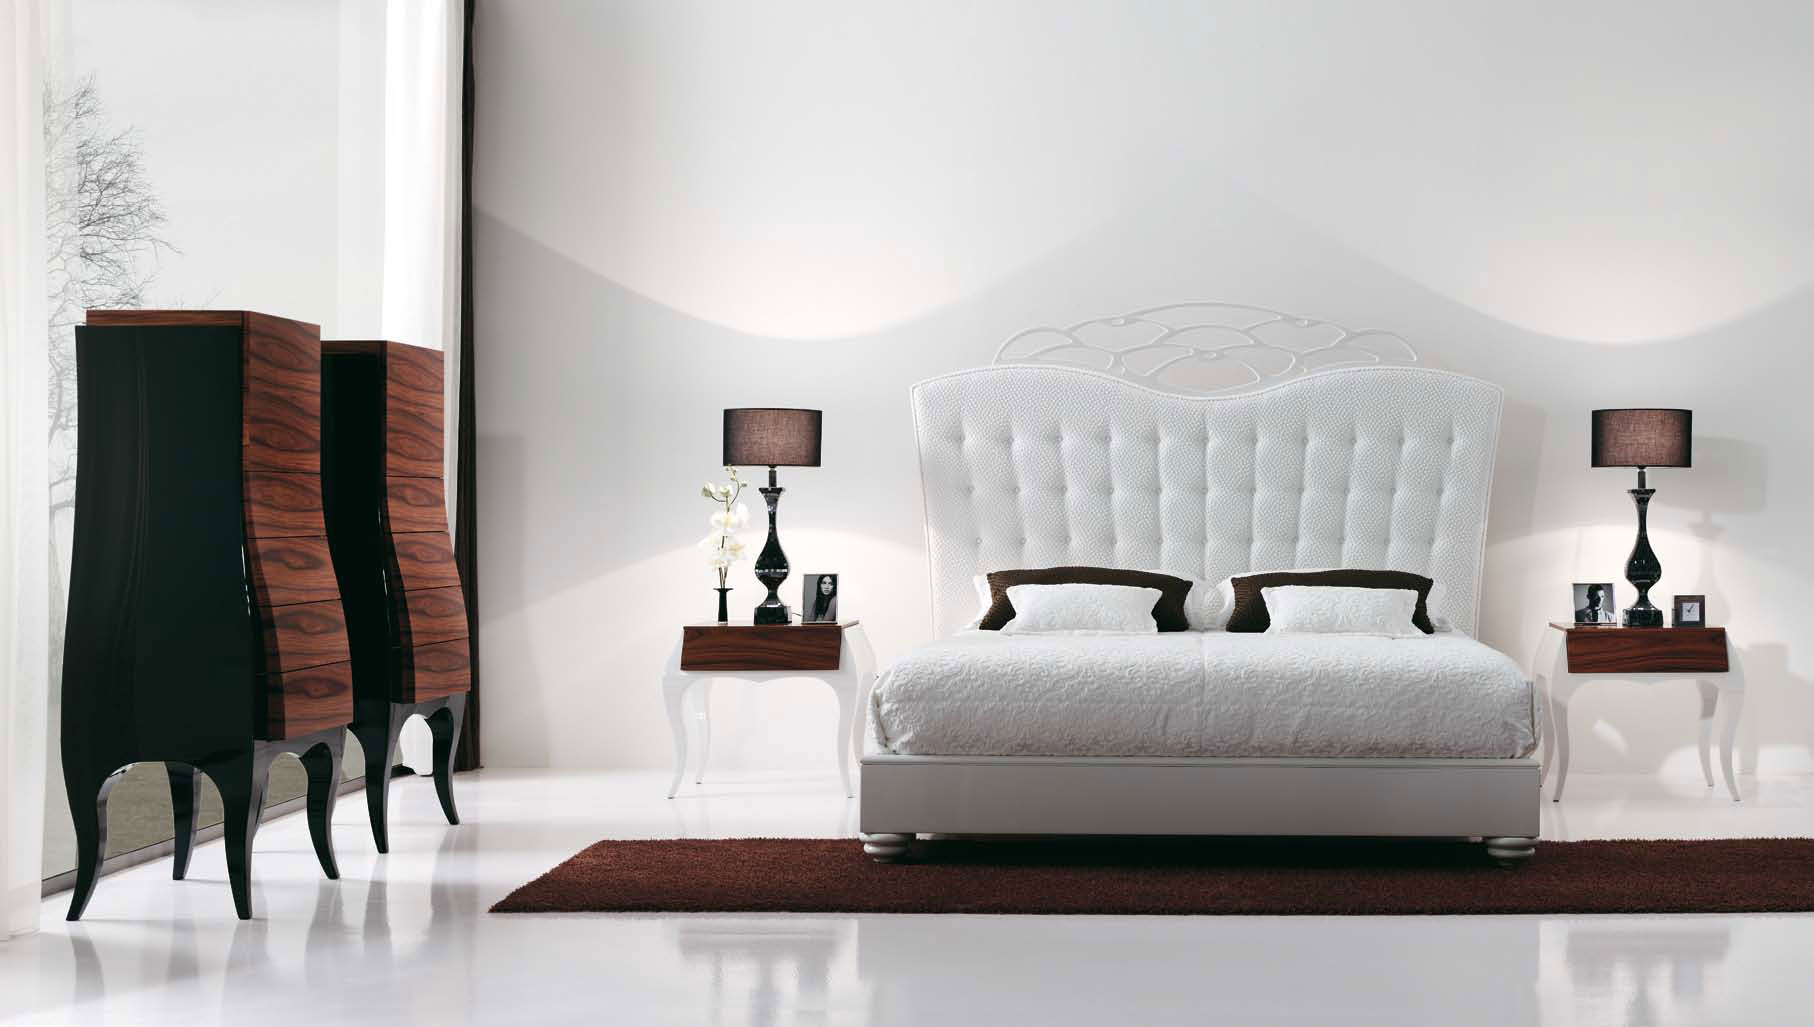 بالصور غرف نوم حديثه , احدث اشكال غرف النوم 3687